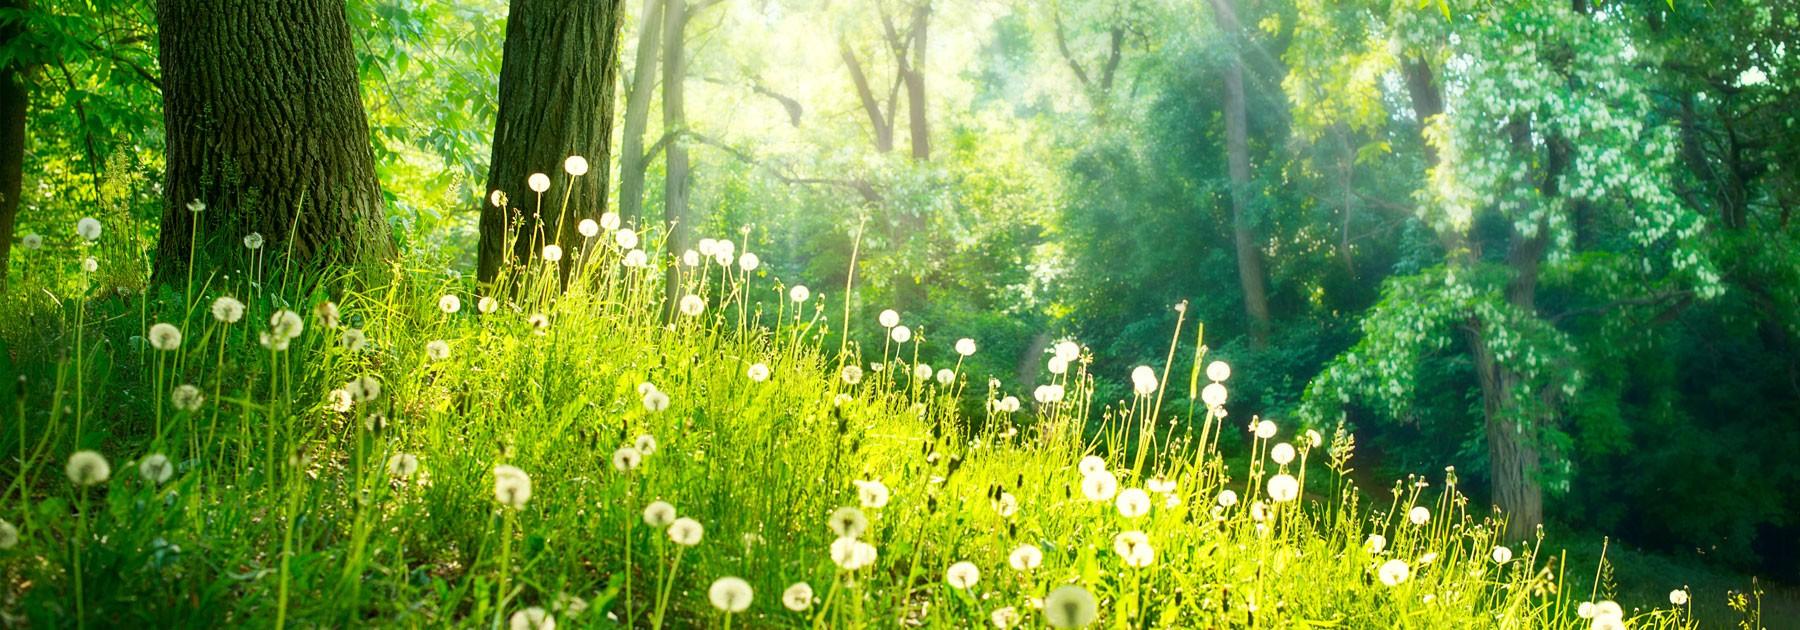 Spring Nature Beautiful Lands - Banner - Nature To Nurture ...